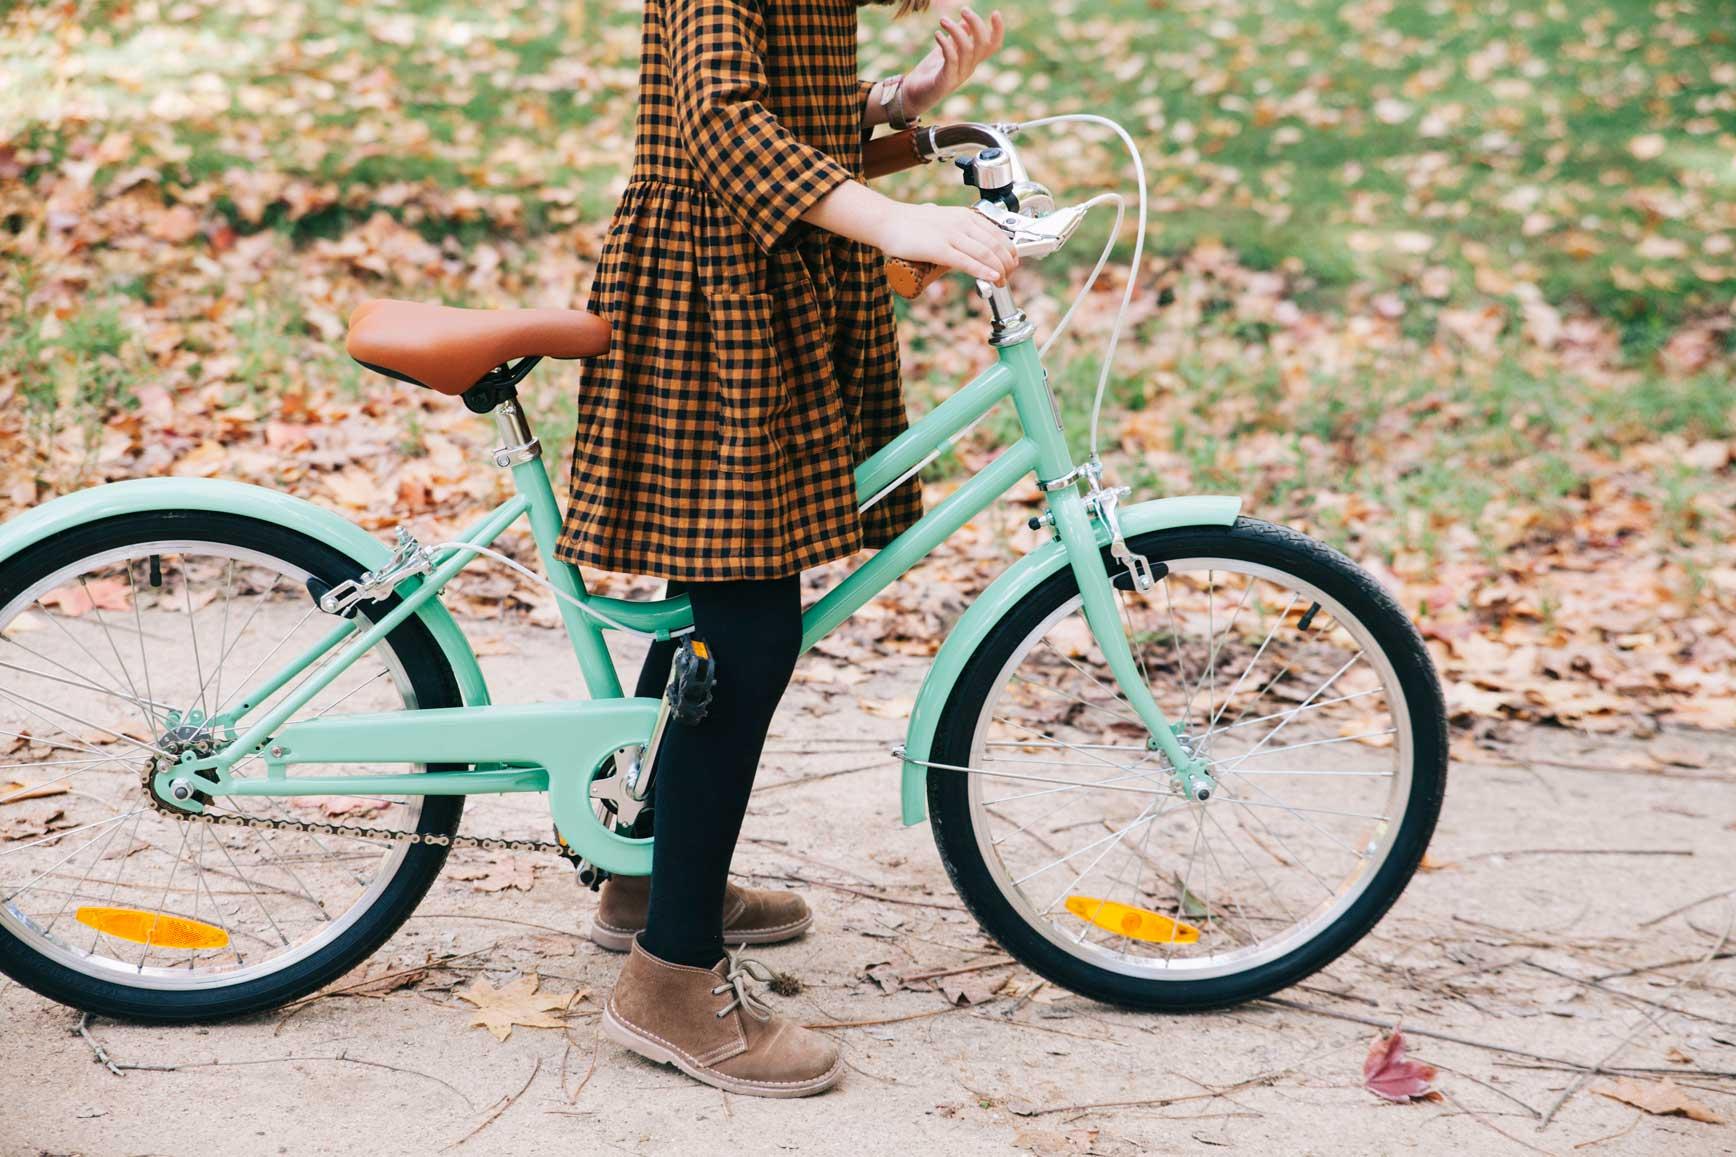 Bicicleta Reid - Newborn riders